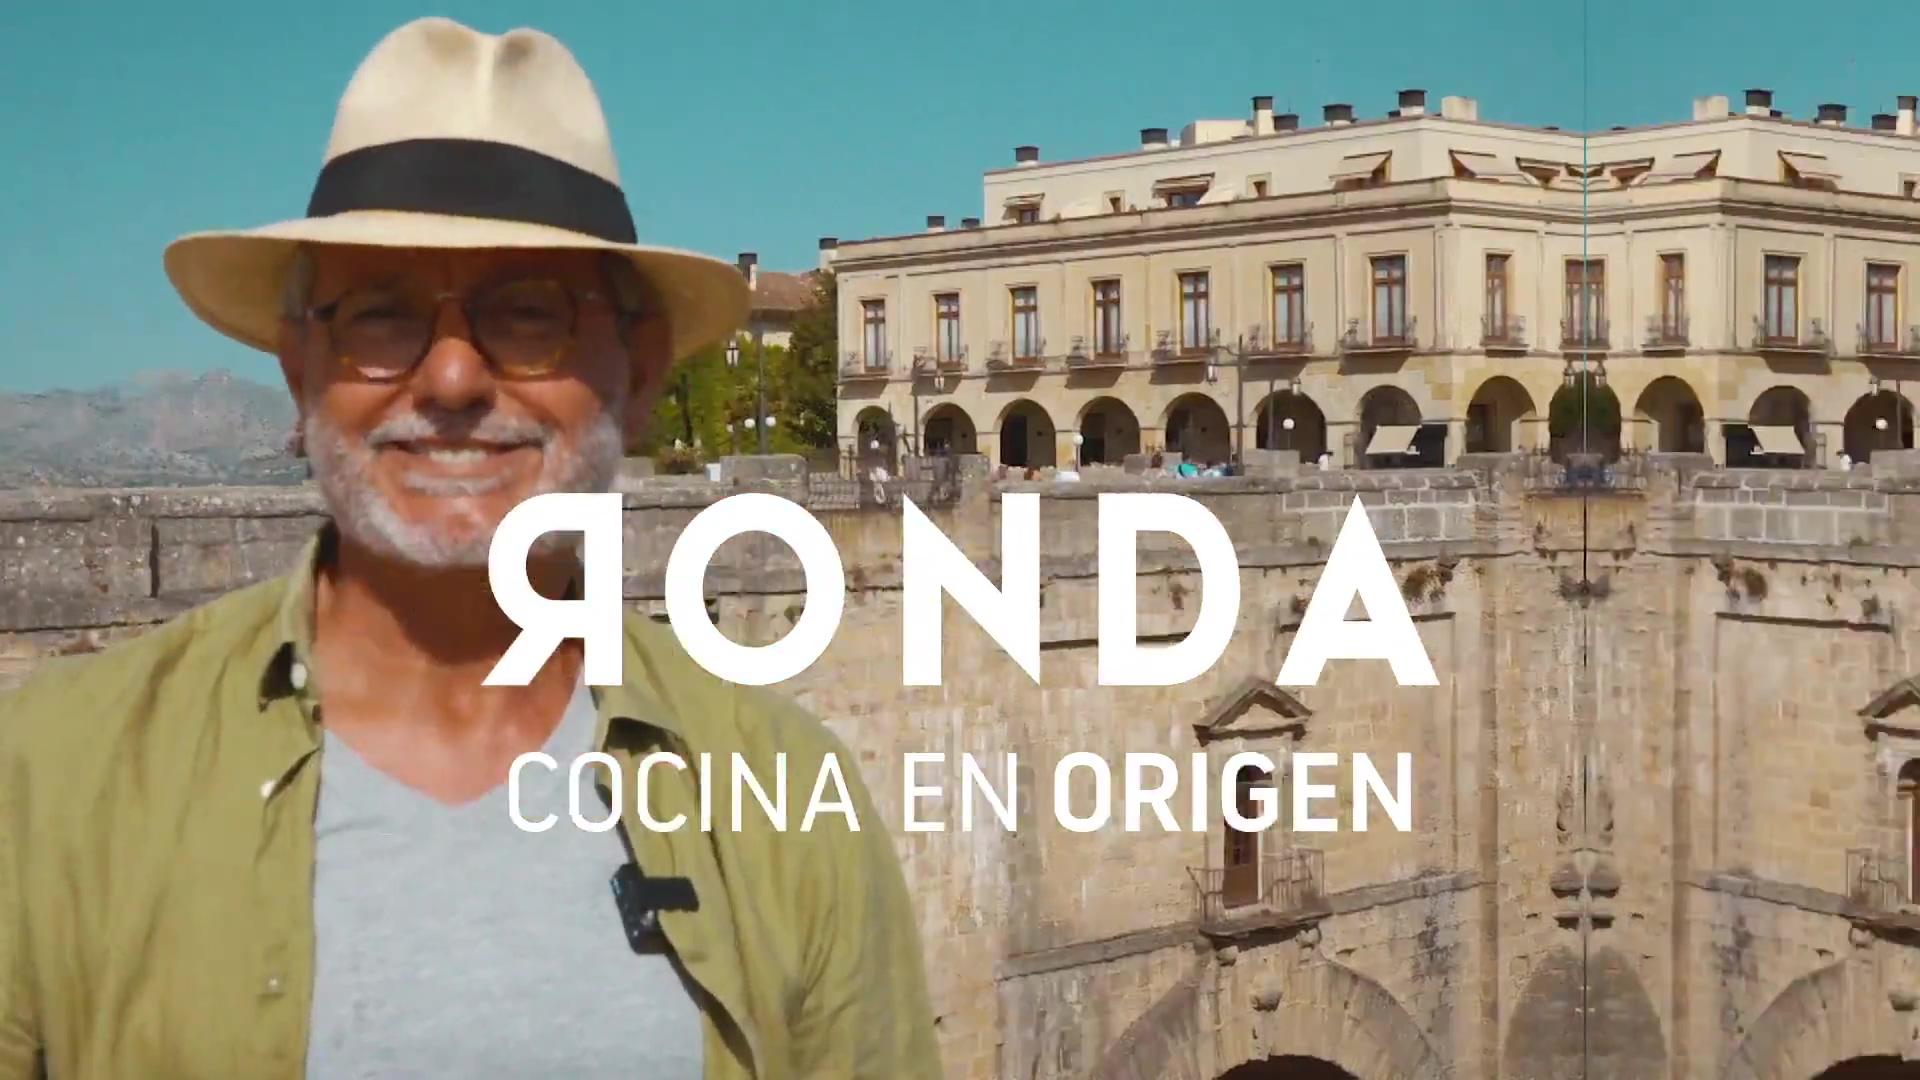 RONDA - MALAGA COCINA EN ORIGEN